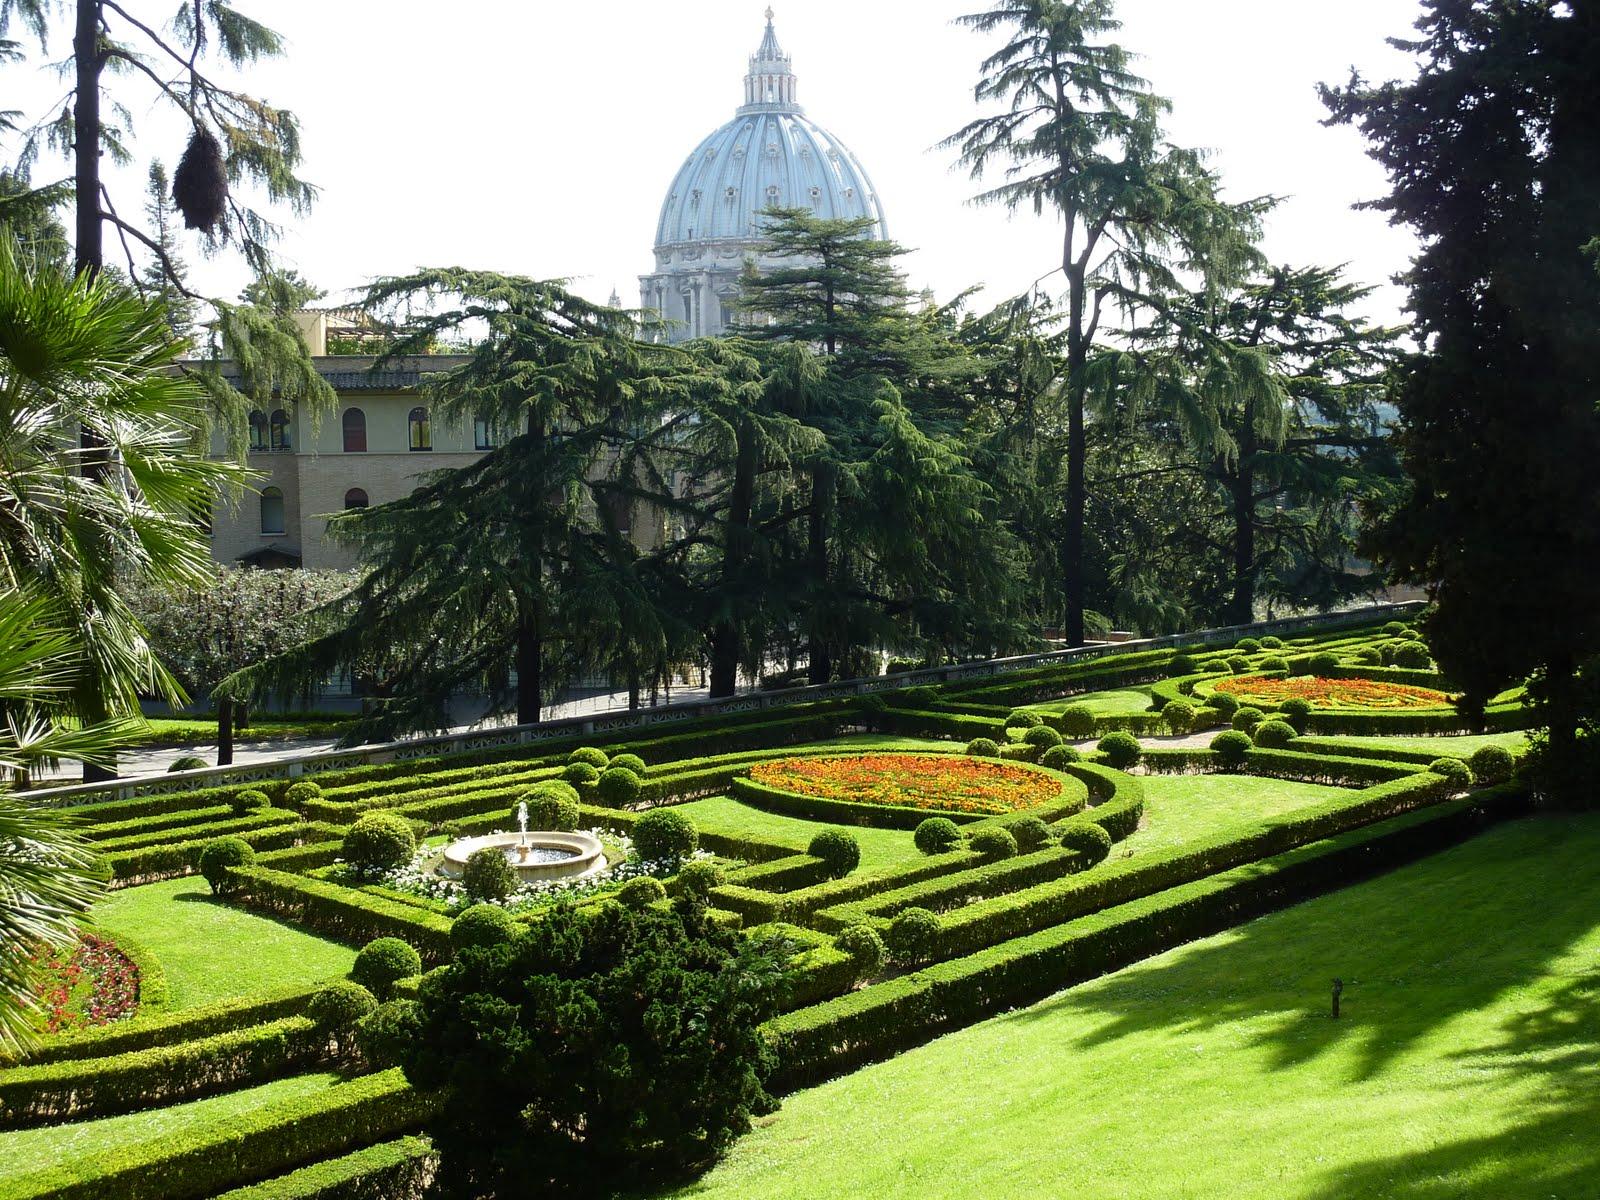 Sunlit Uplands Vatican Gardens Provide Prayerful Oasis